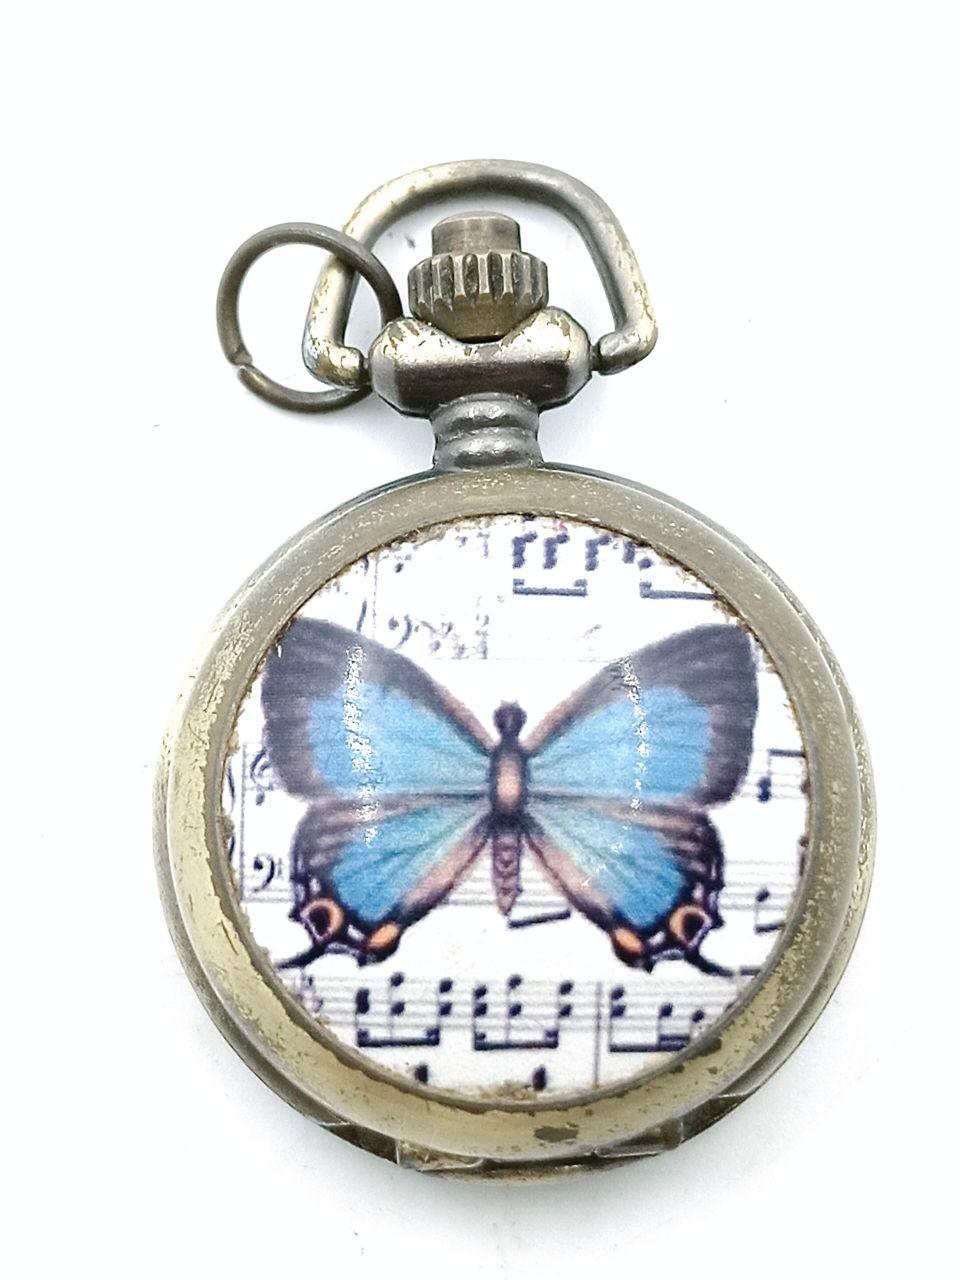 Enameled pocket watch